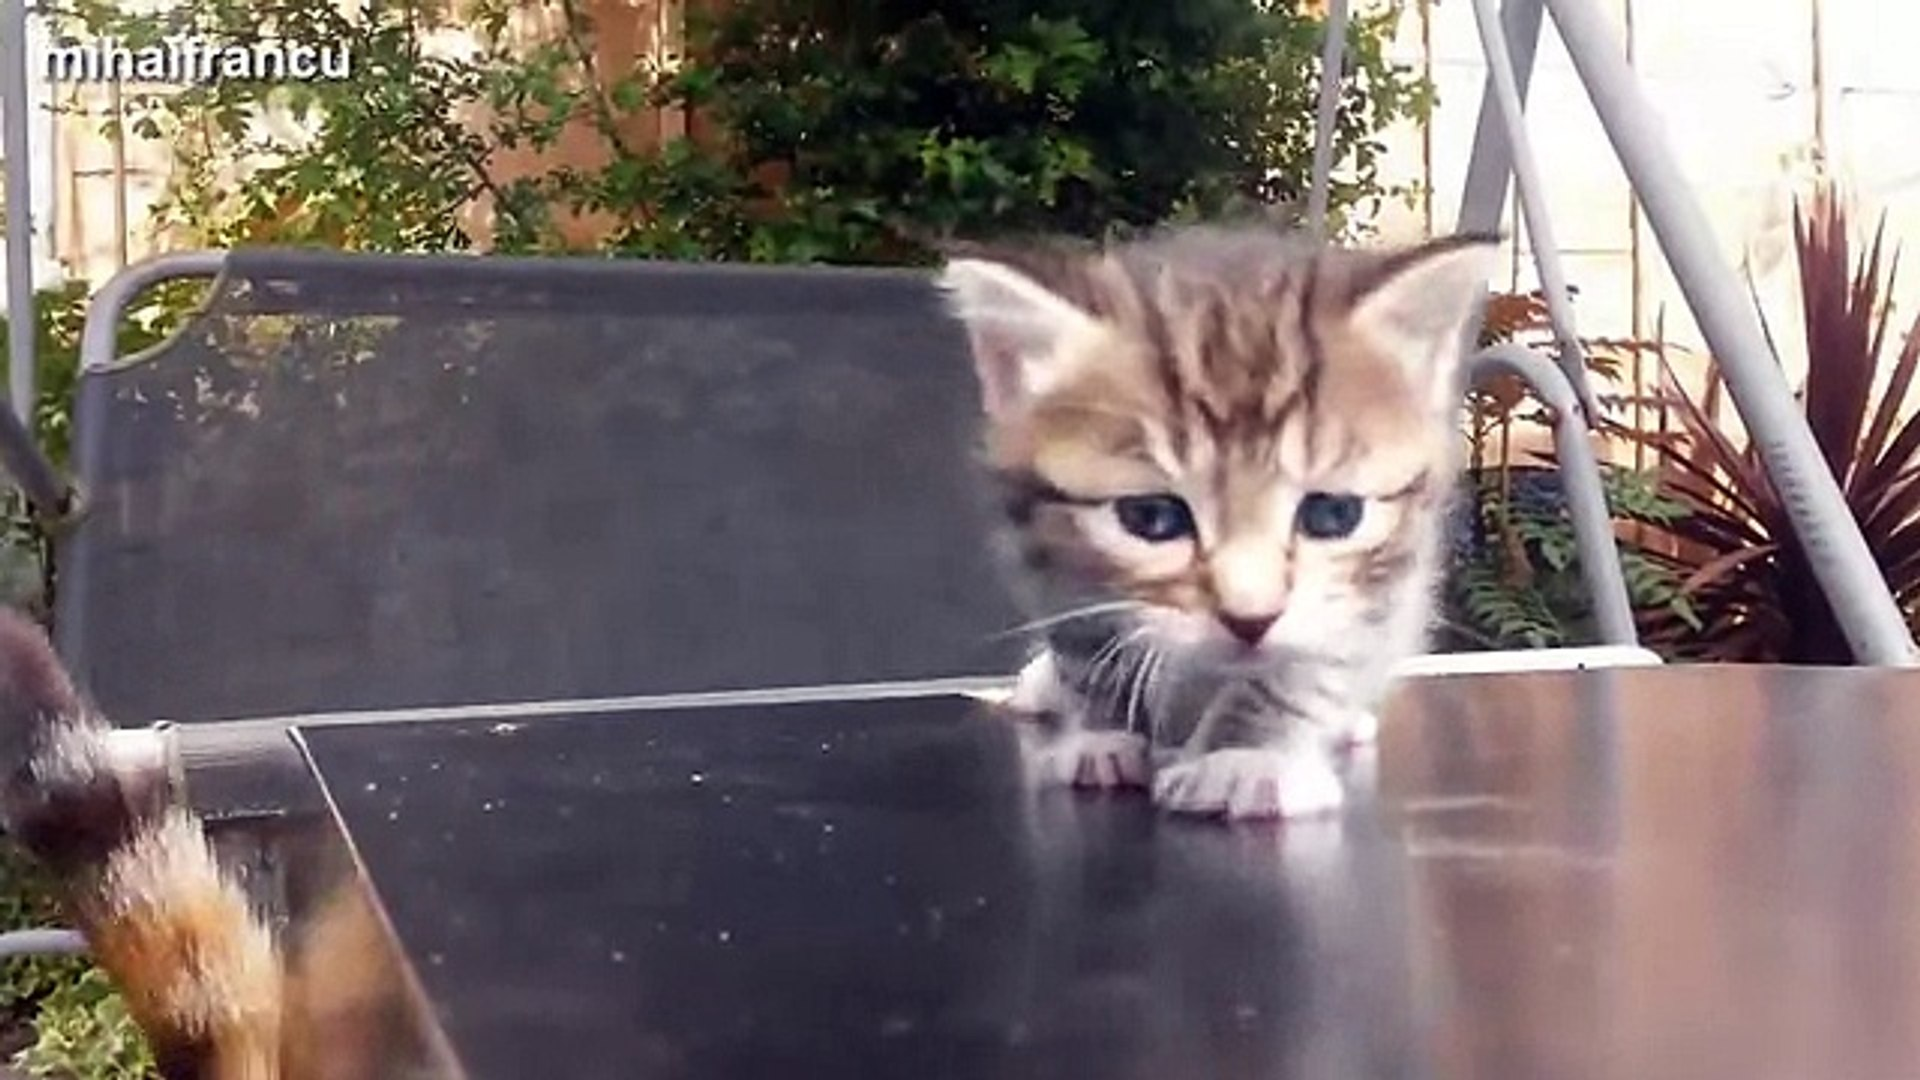 Funny Cat baby - funny cat - funny cat movie - funny cat food - fun with cat - fun with funny -